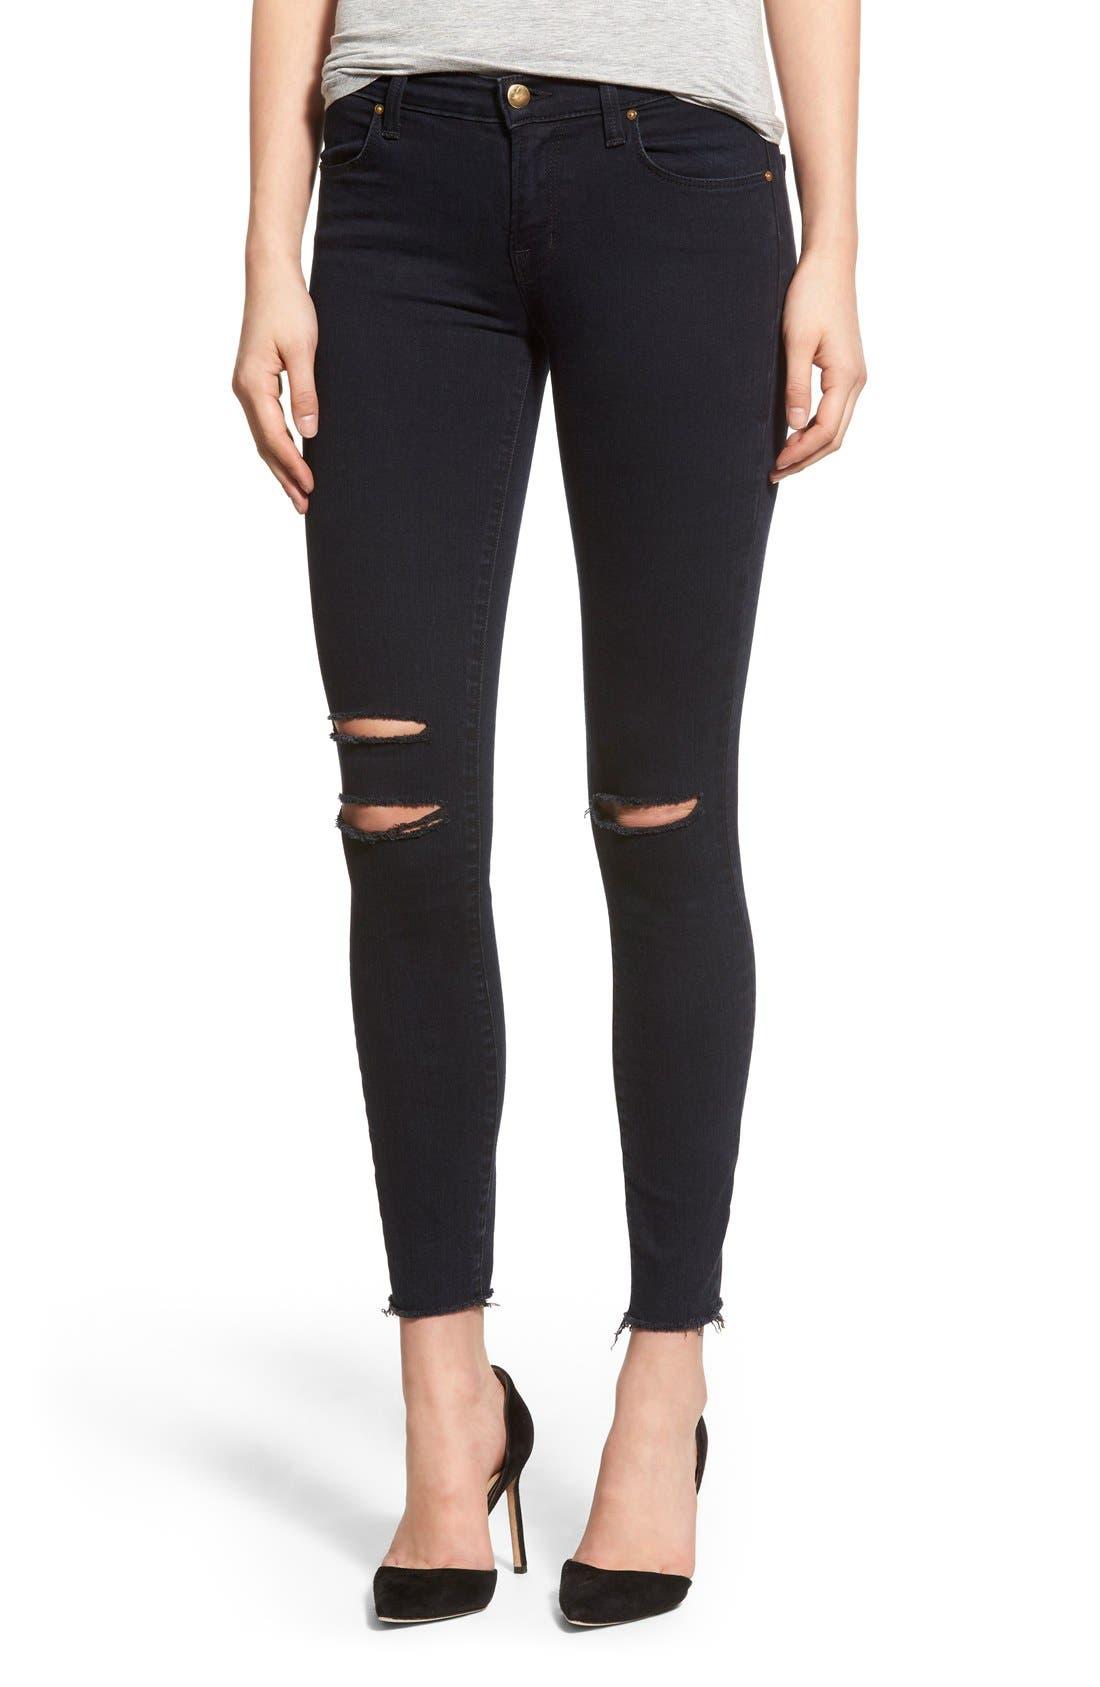 Alternate Image 1 Selected - J Brand Destroyed Crop Skinny Jeans (Blue Mercy)